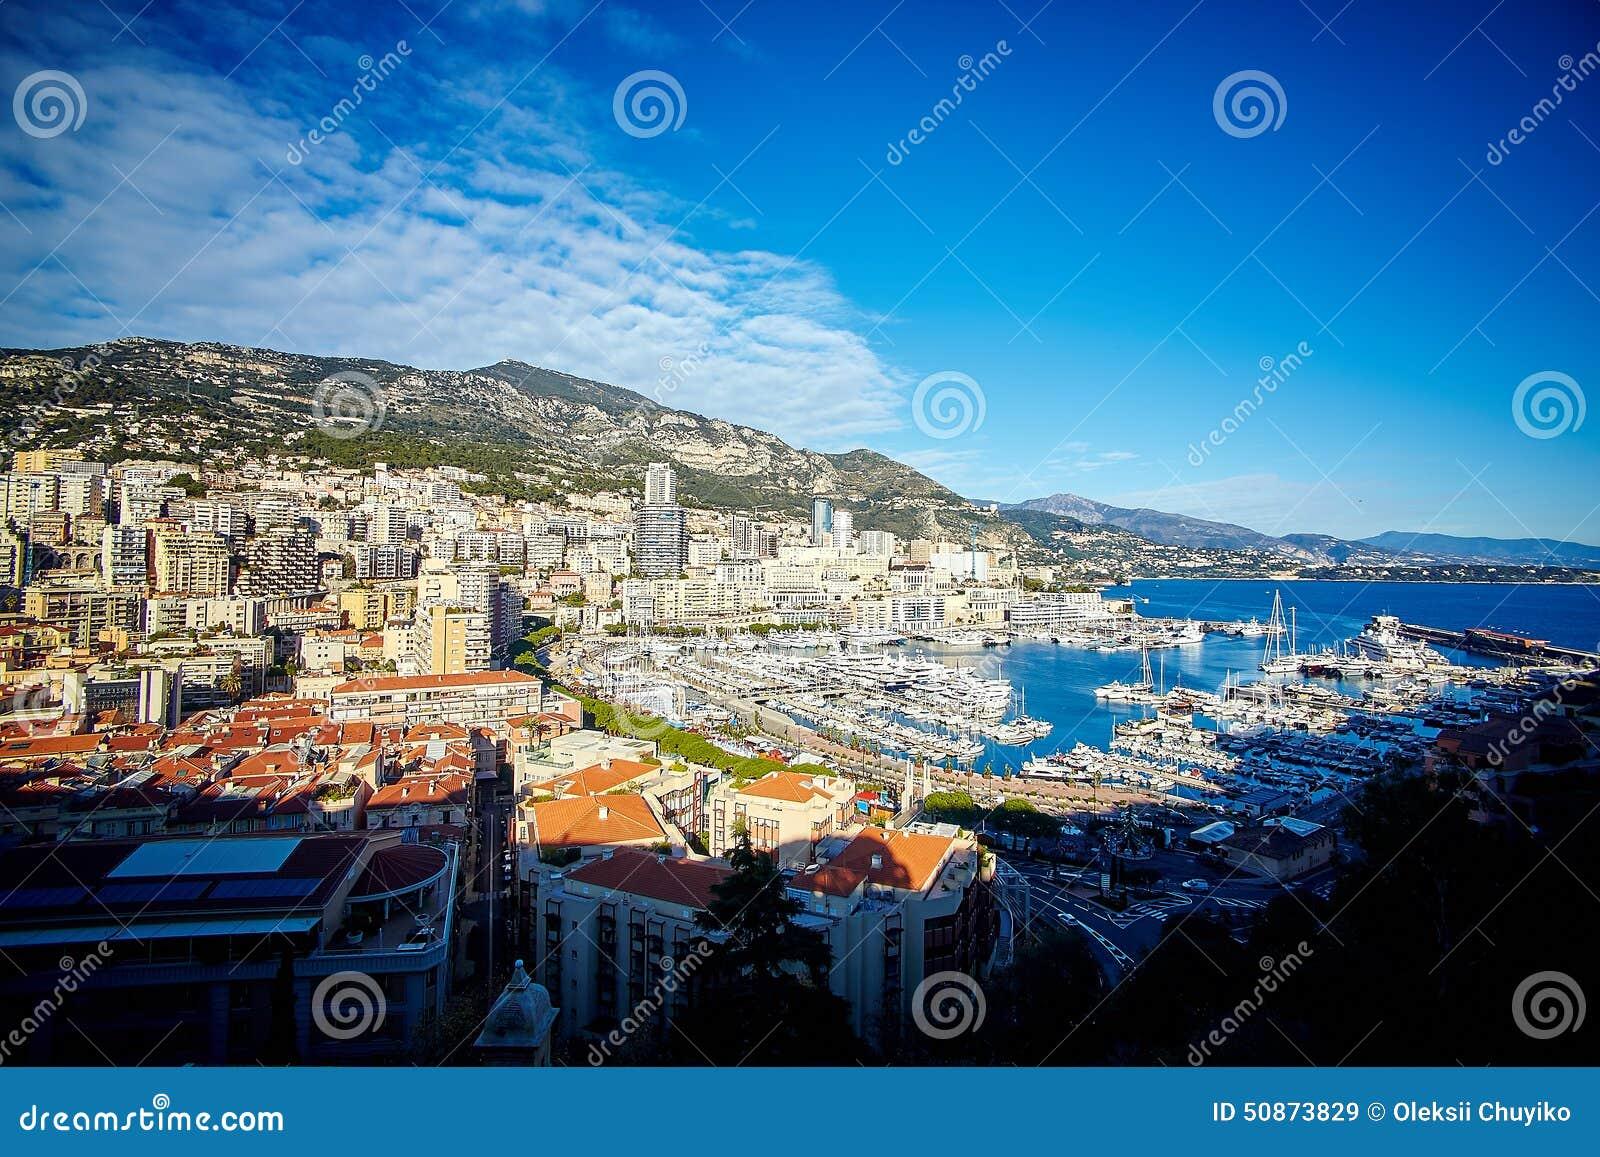 Woonkwarten, Monaco, Frankrijk